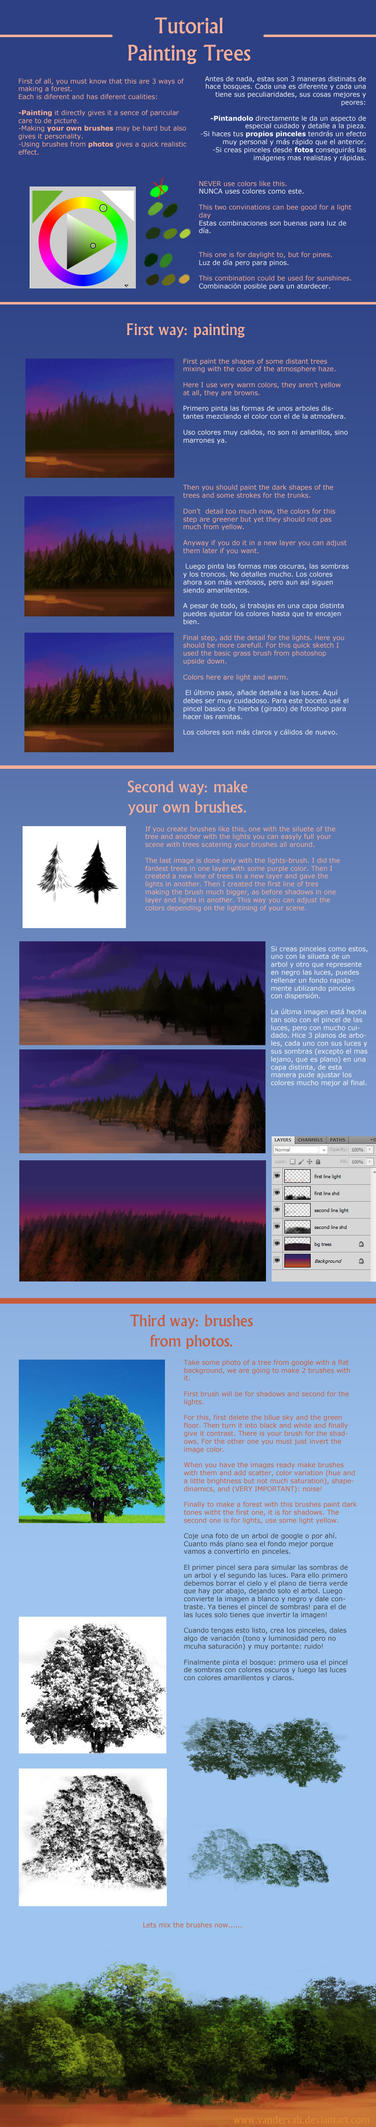 Painting trees tutorial by vandervals